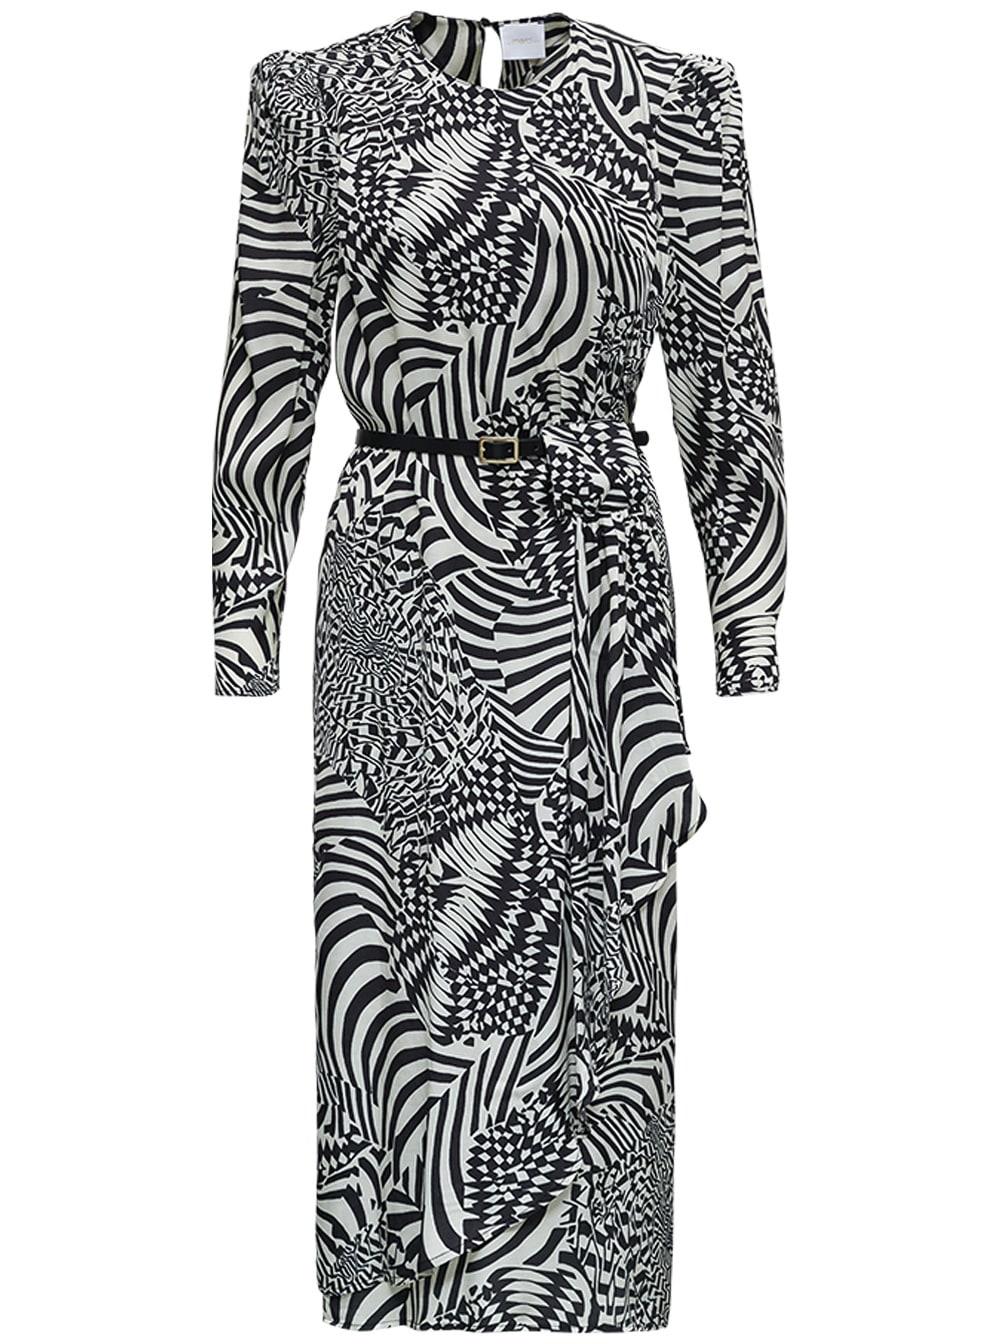 Black And White Geometric Printed Dress With Belt